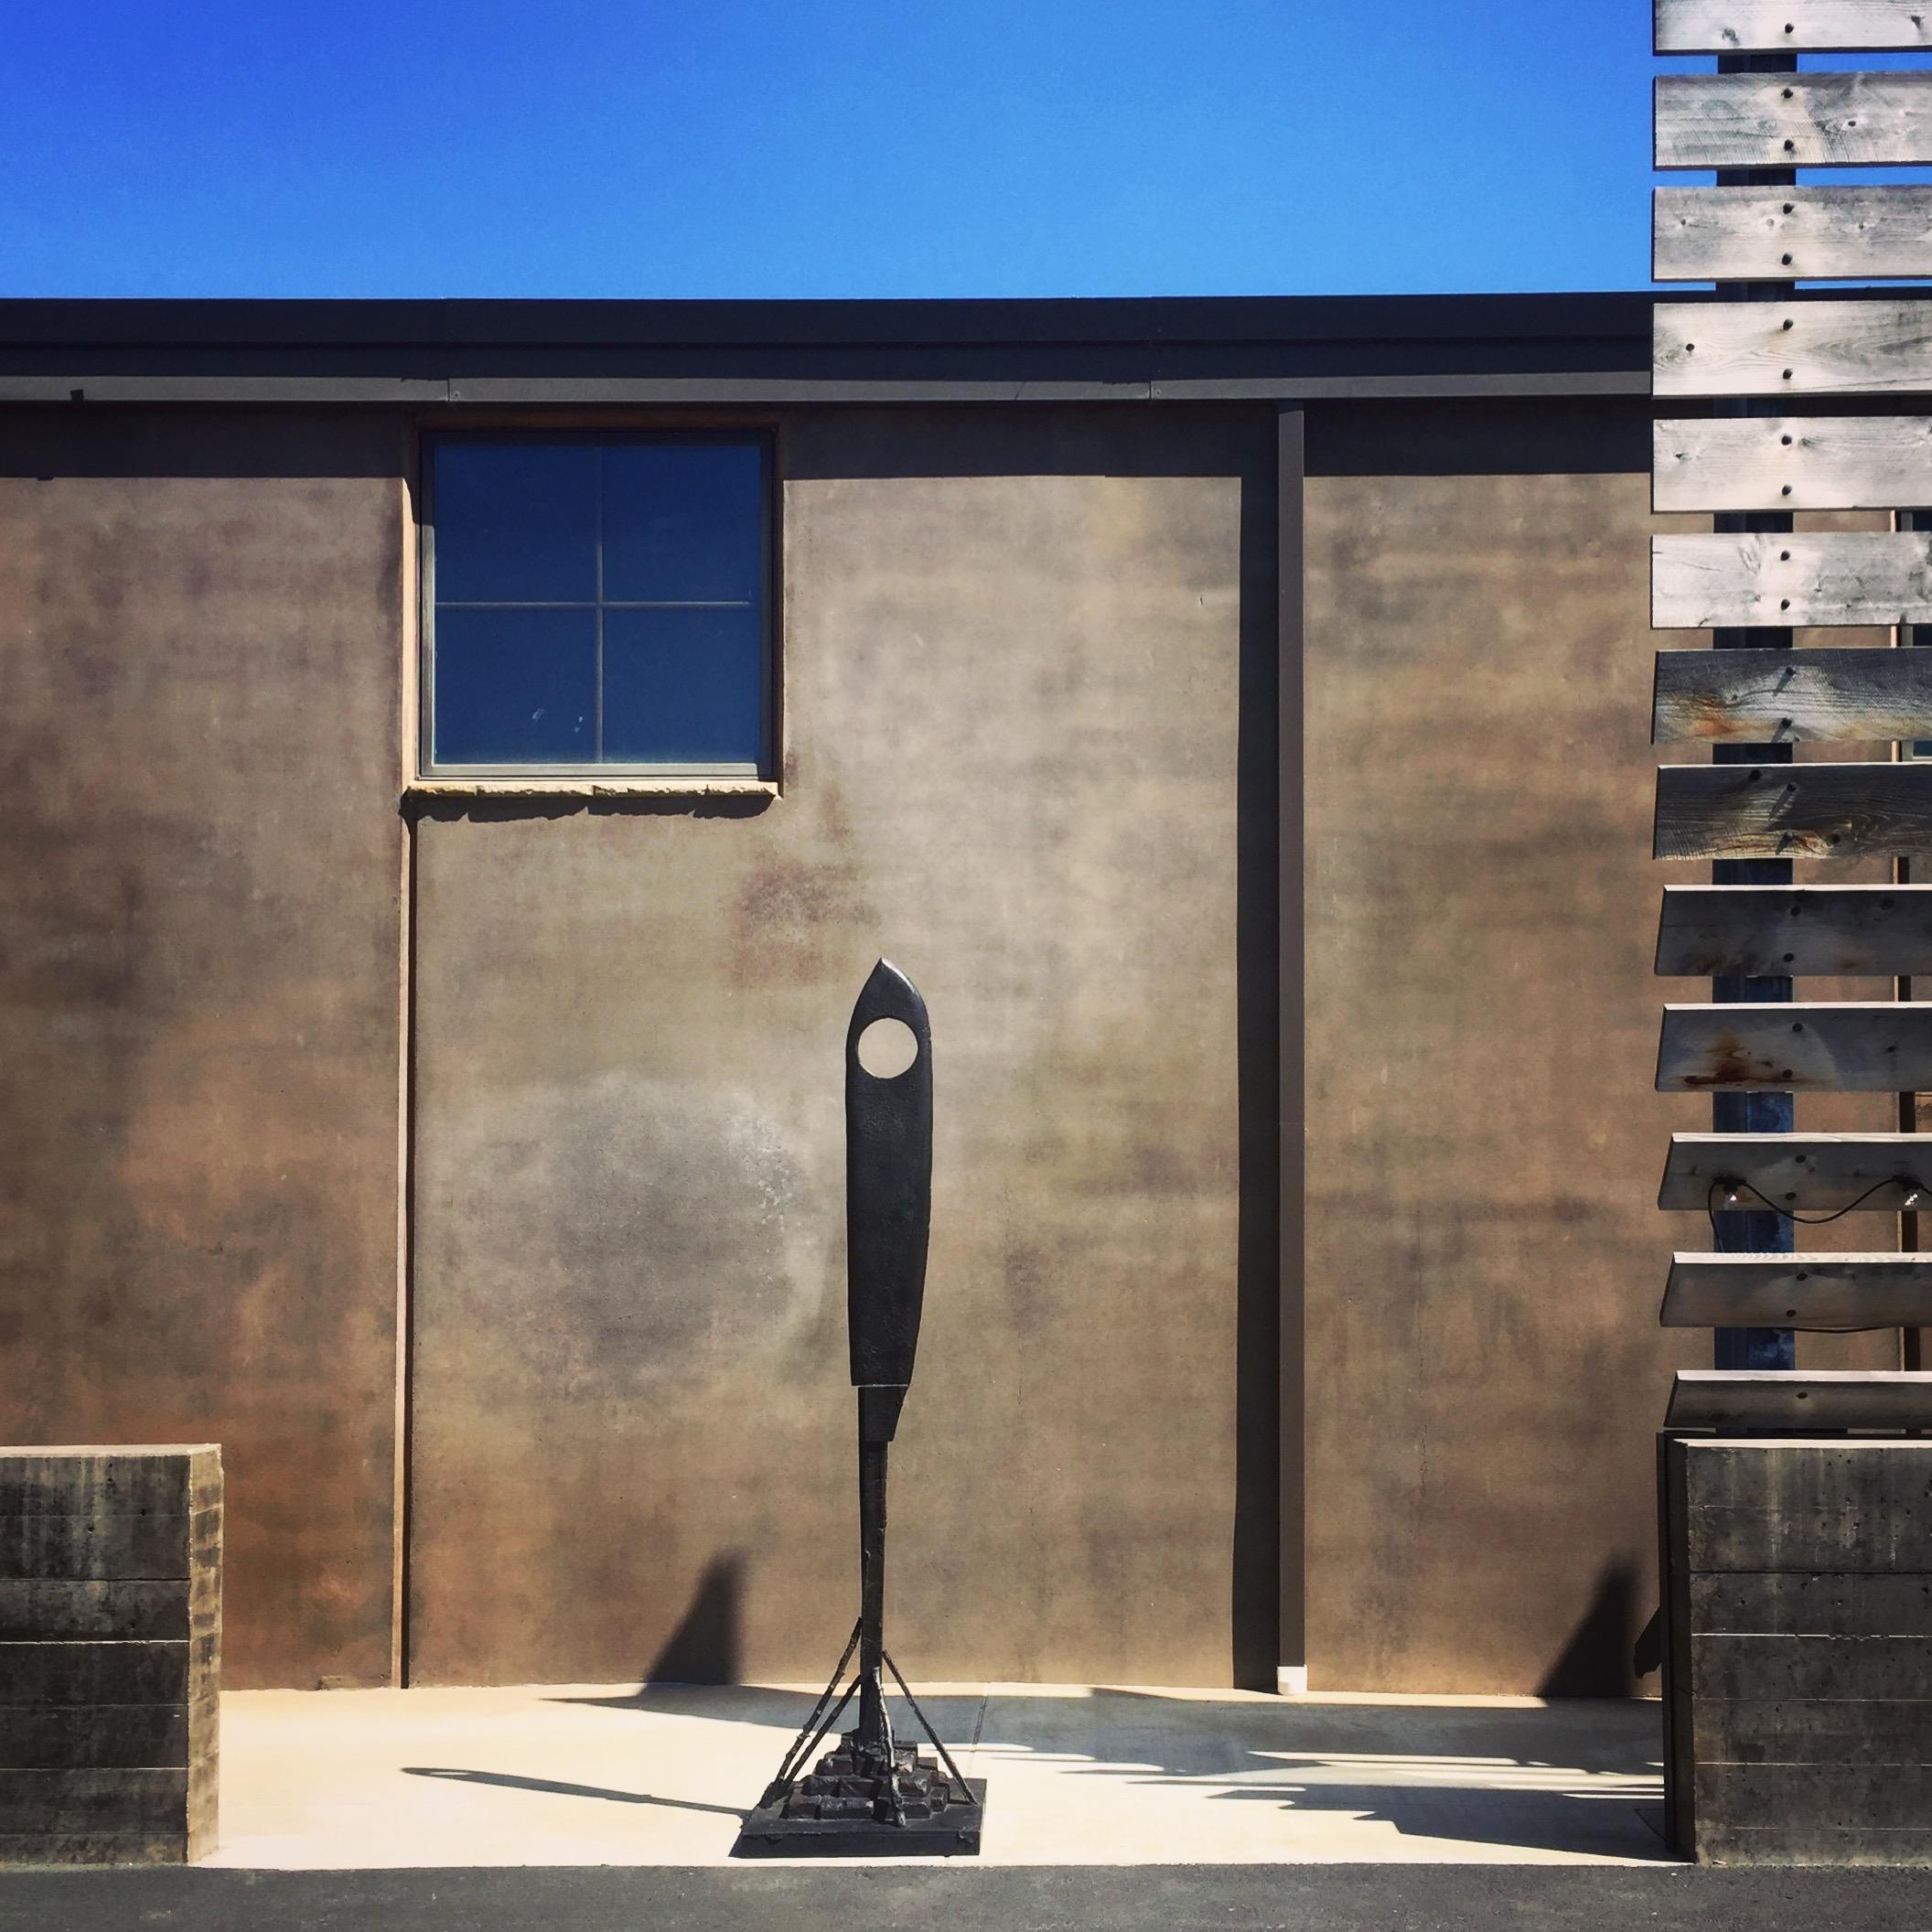 Trajectory II – Lincoln Square II